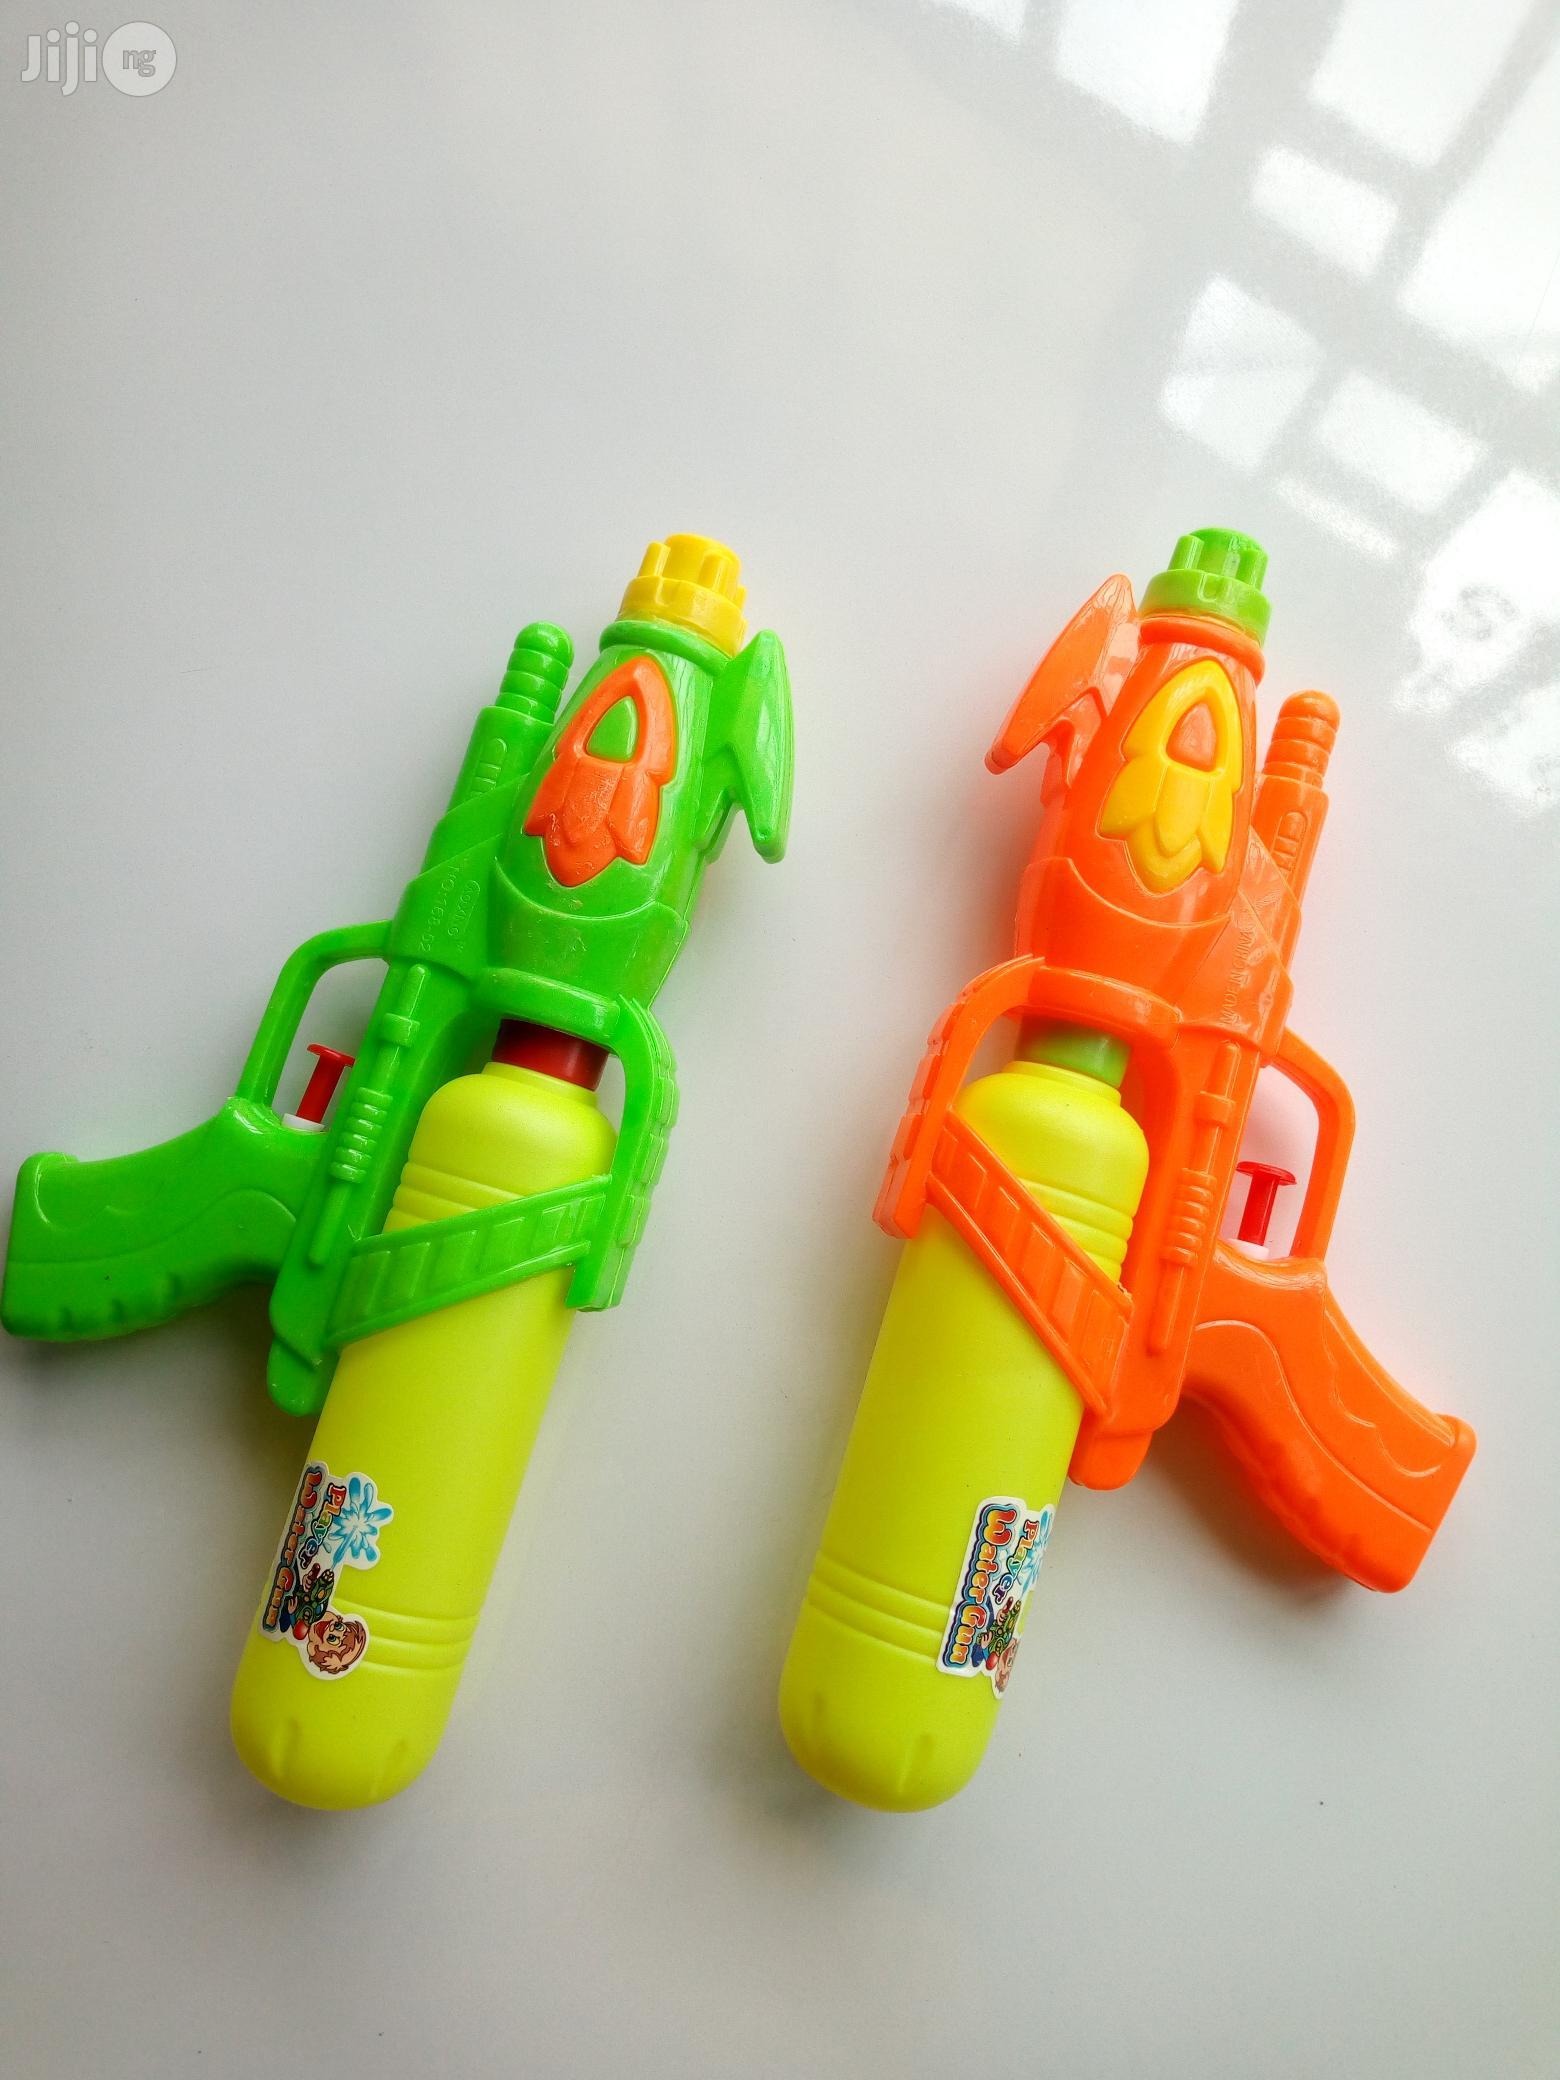 Interesting Children Water Guns